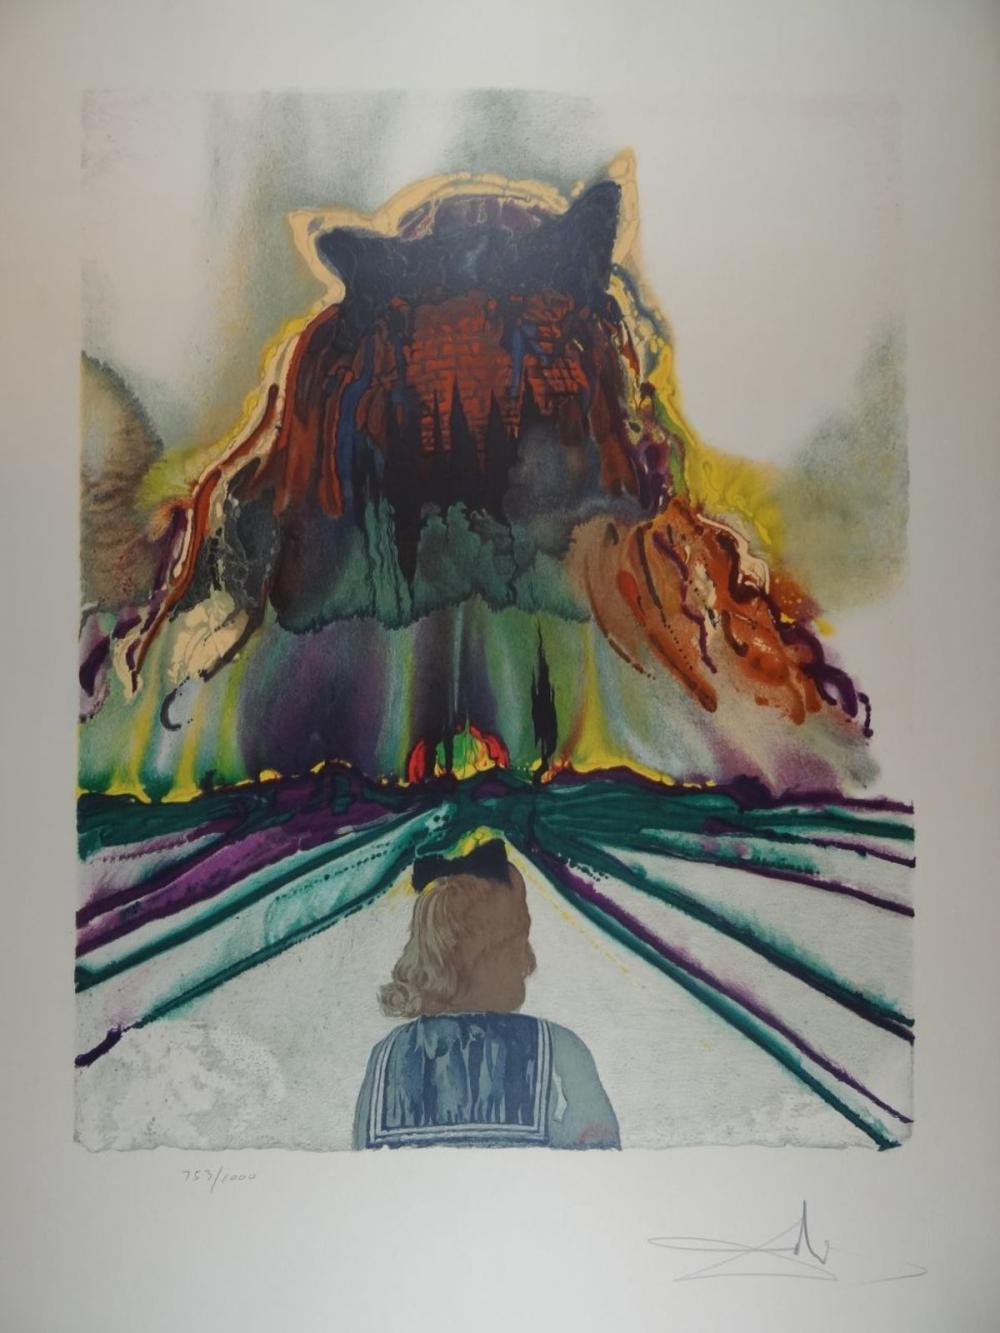 Salvador DALI (1904-1989) Four Dreams of Paradise (1973) 4 Lithografien